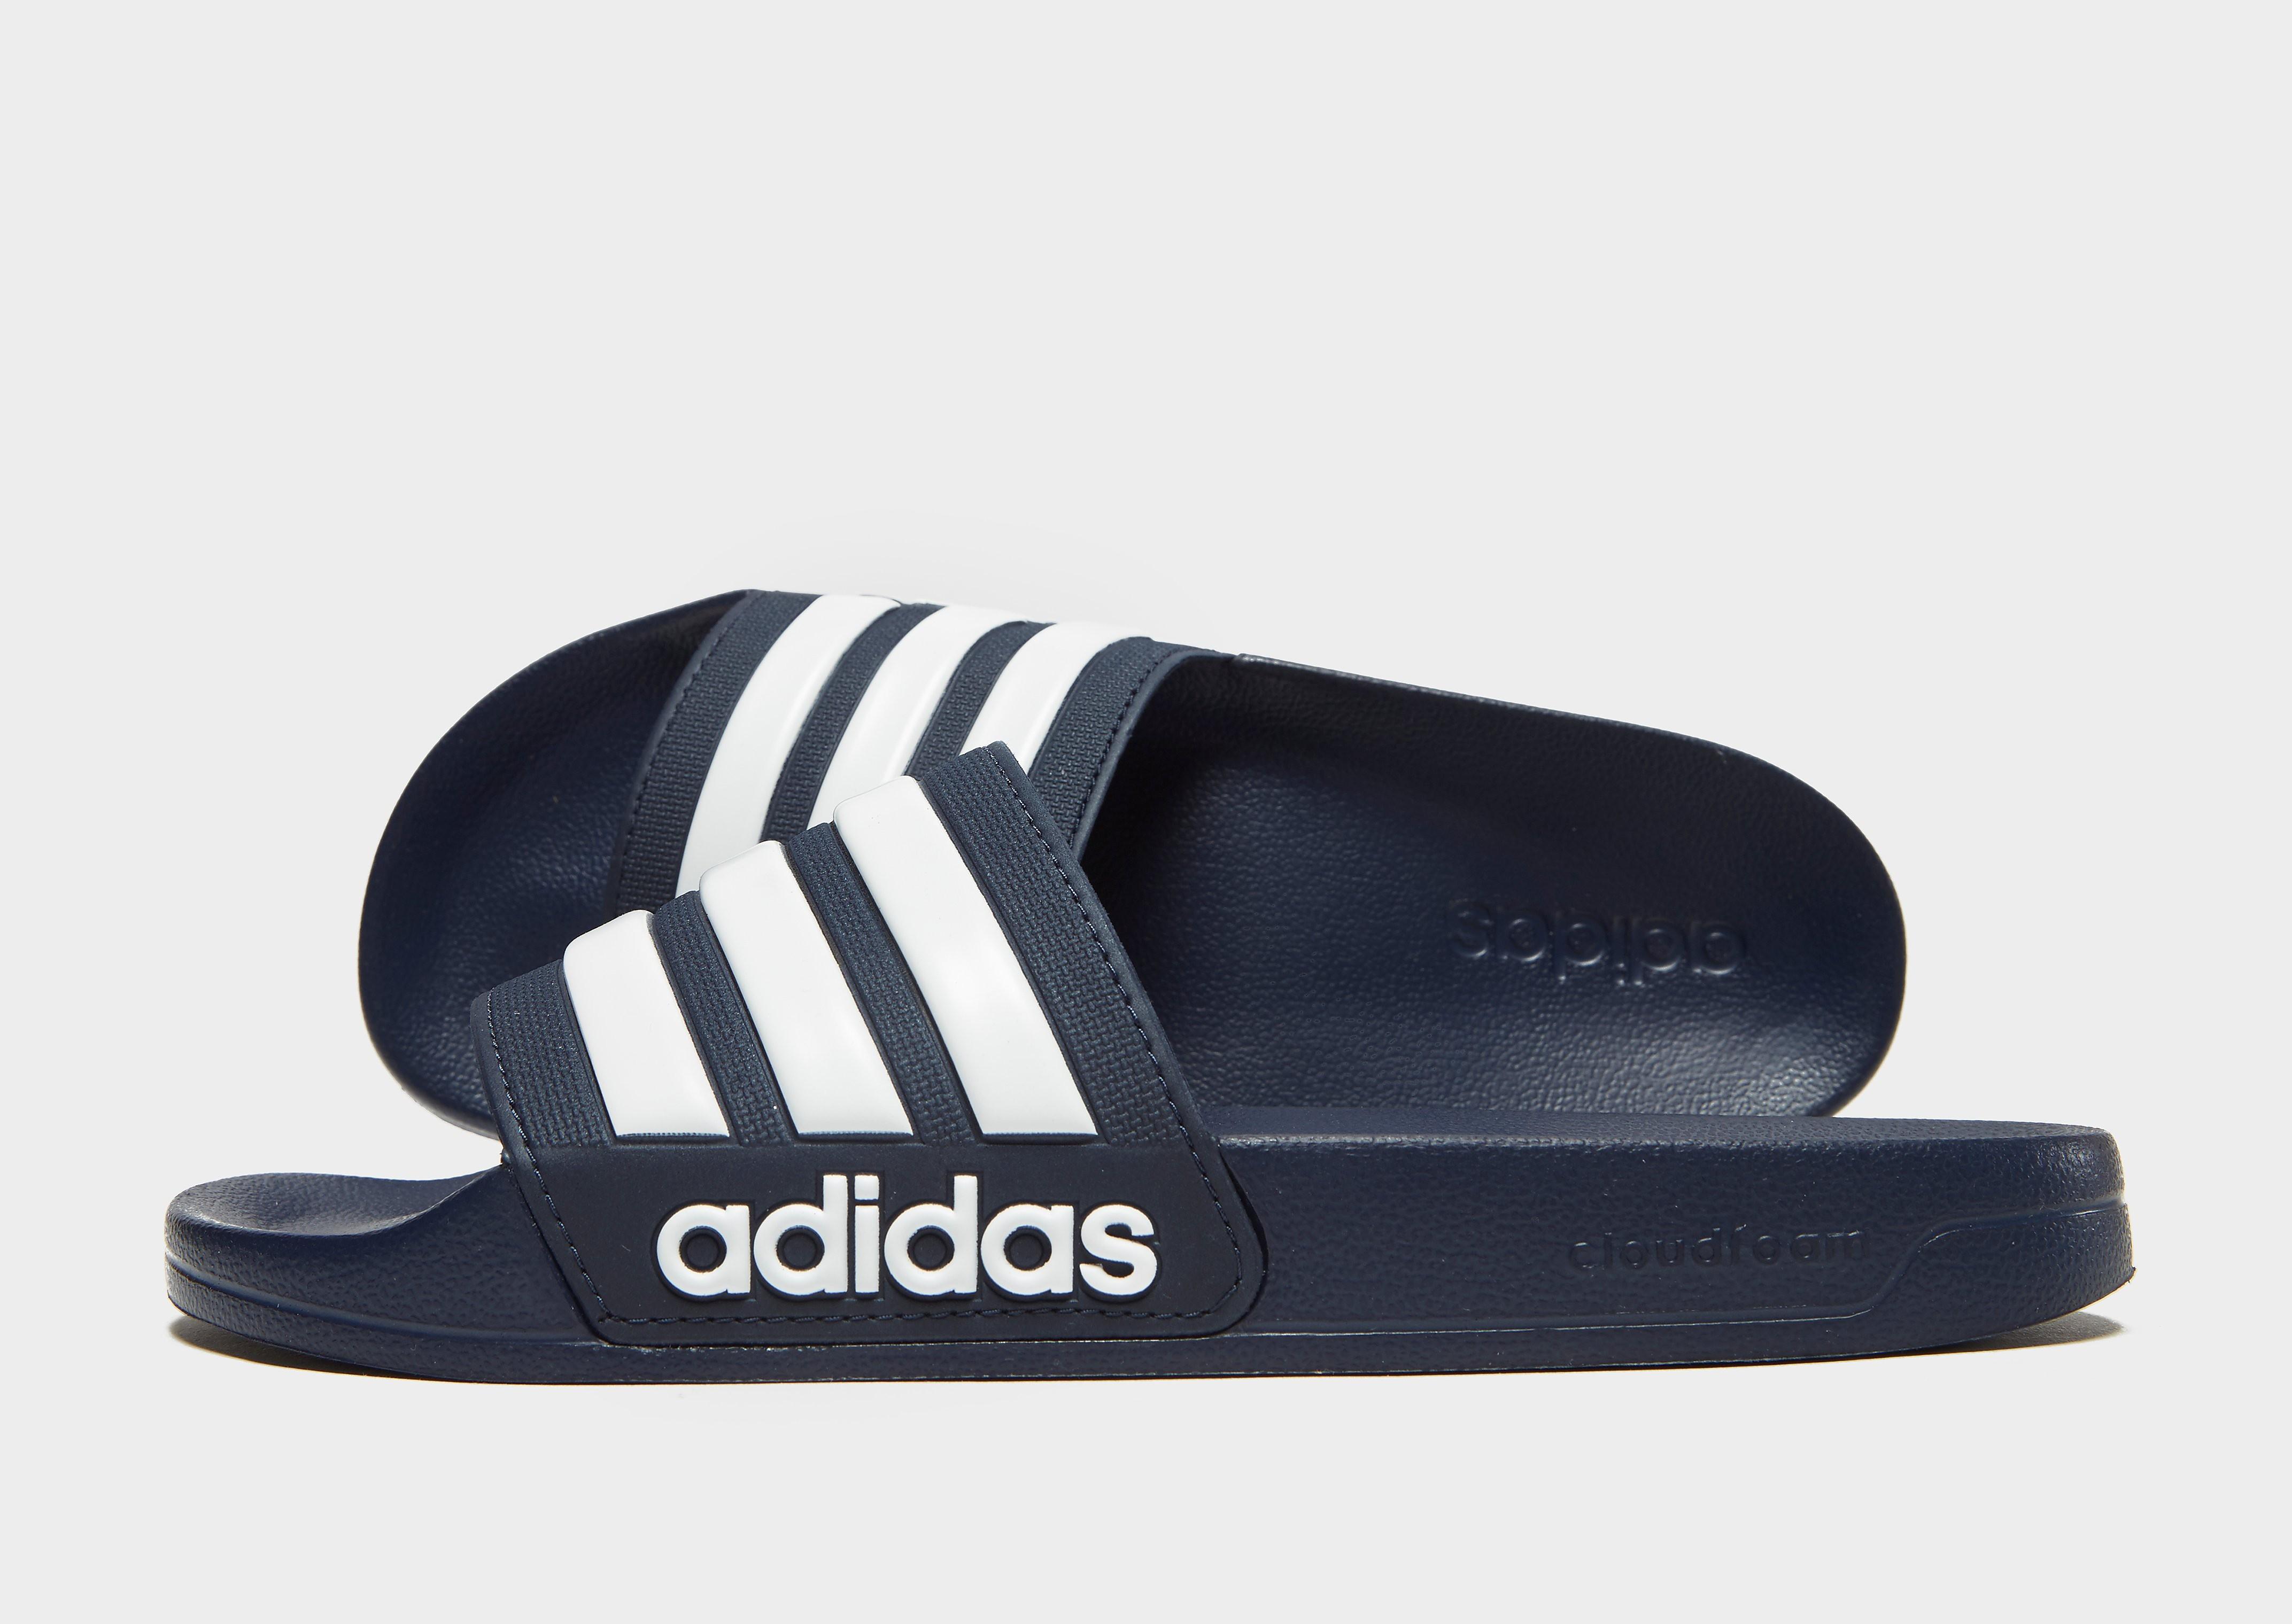 adidas Cloudfoam Adilette Slides - Blau - Mens, Blau